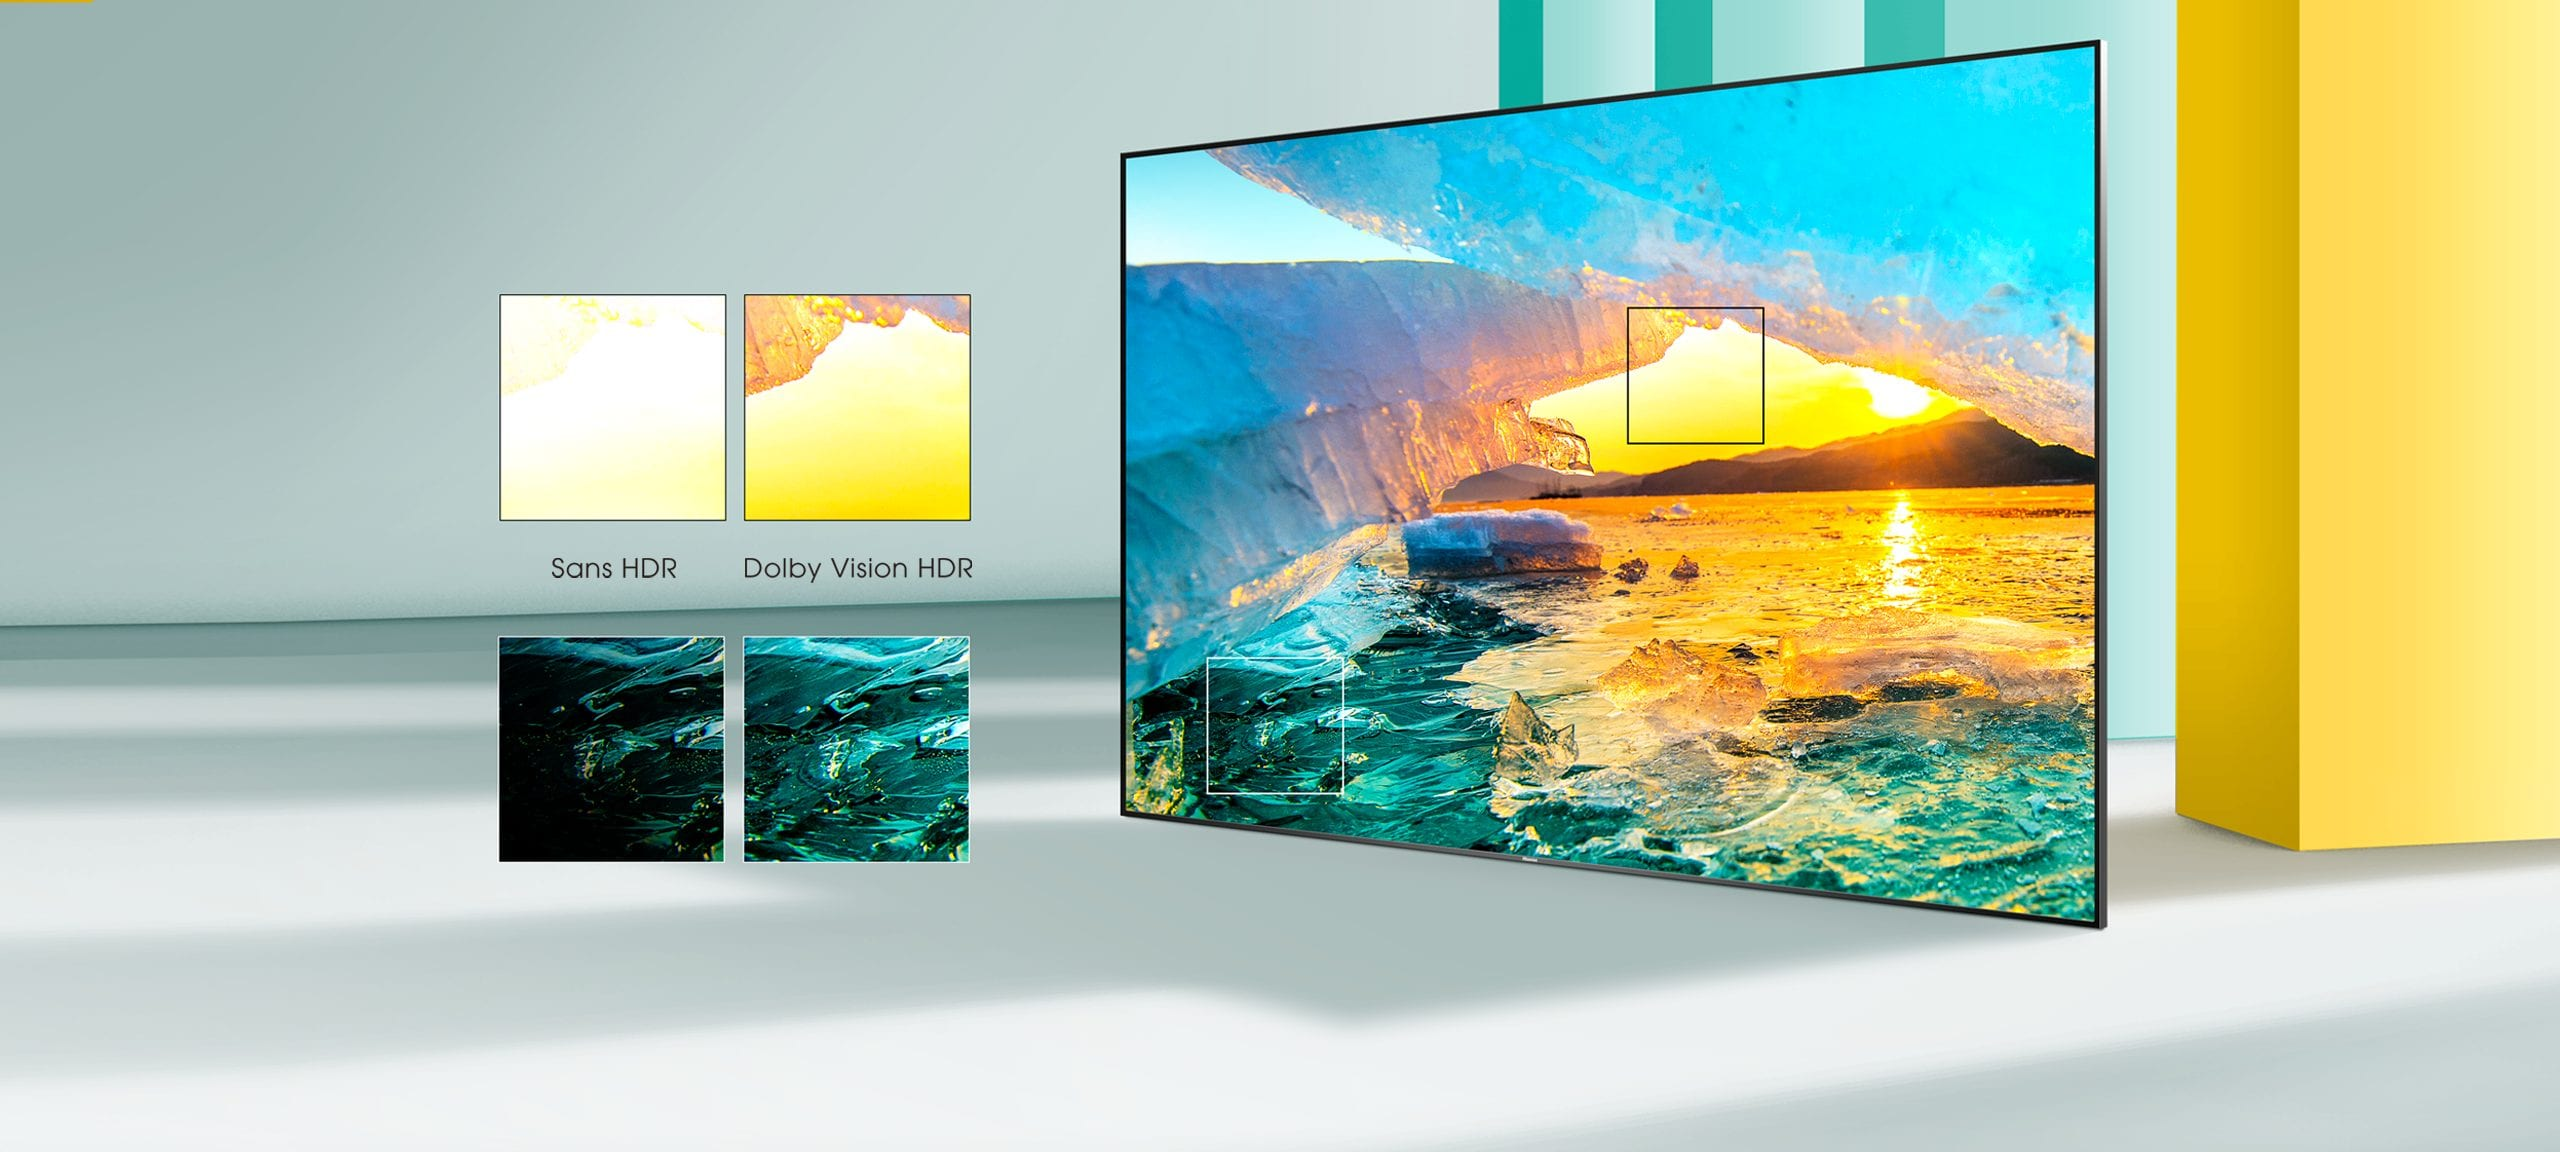 [TV] – 2020 – 03 – Dolby vison – UHD